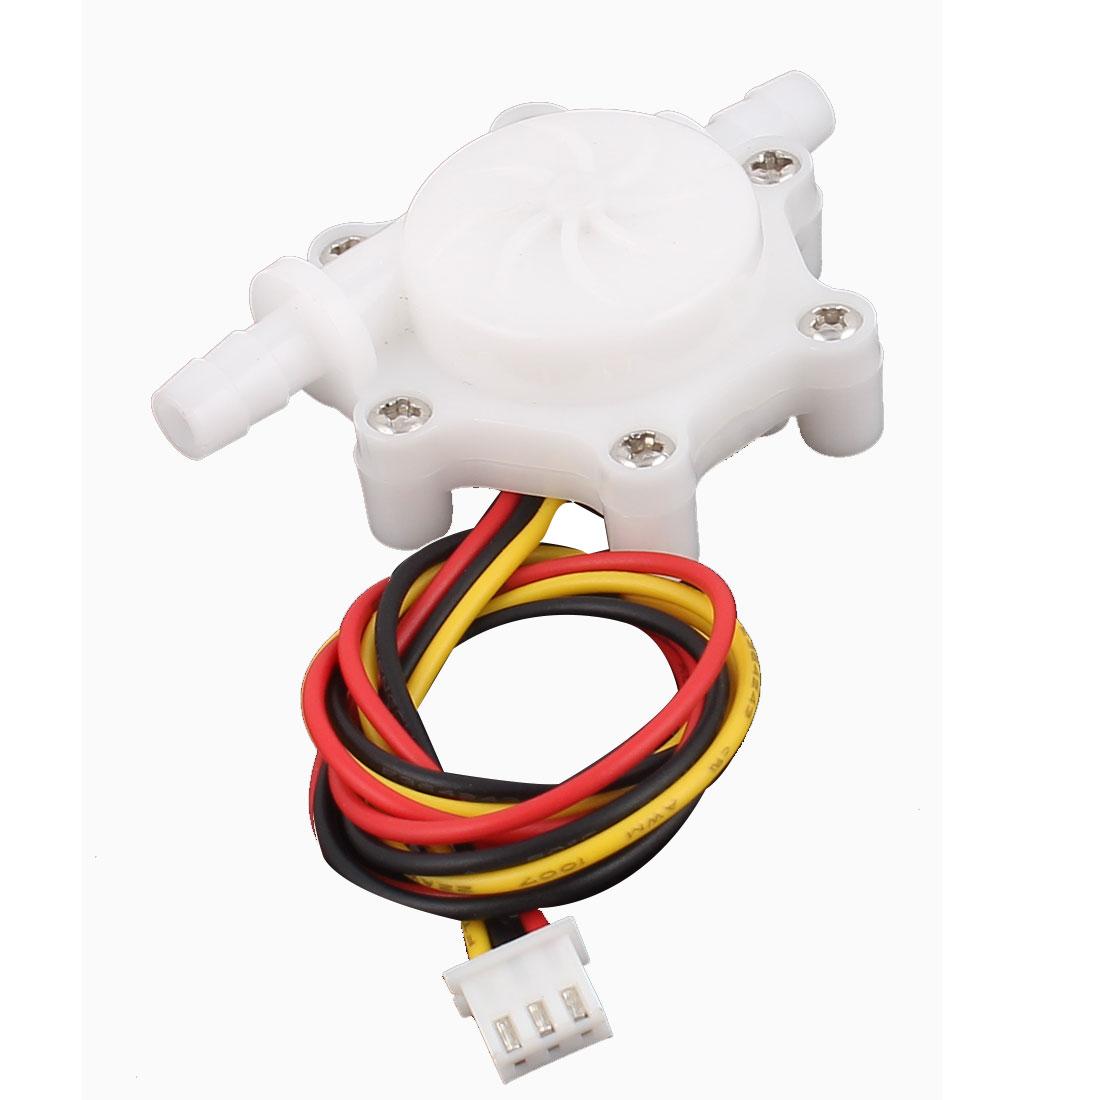 0.2-2.5L/min 6mm Outlet Outer Dia Water Flow Counter Sensor SEN-HZ06C